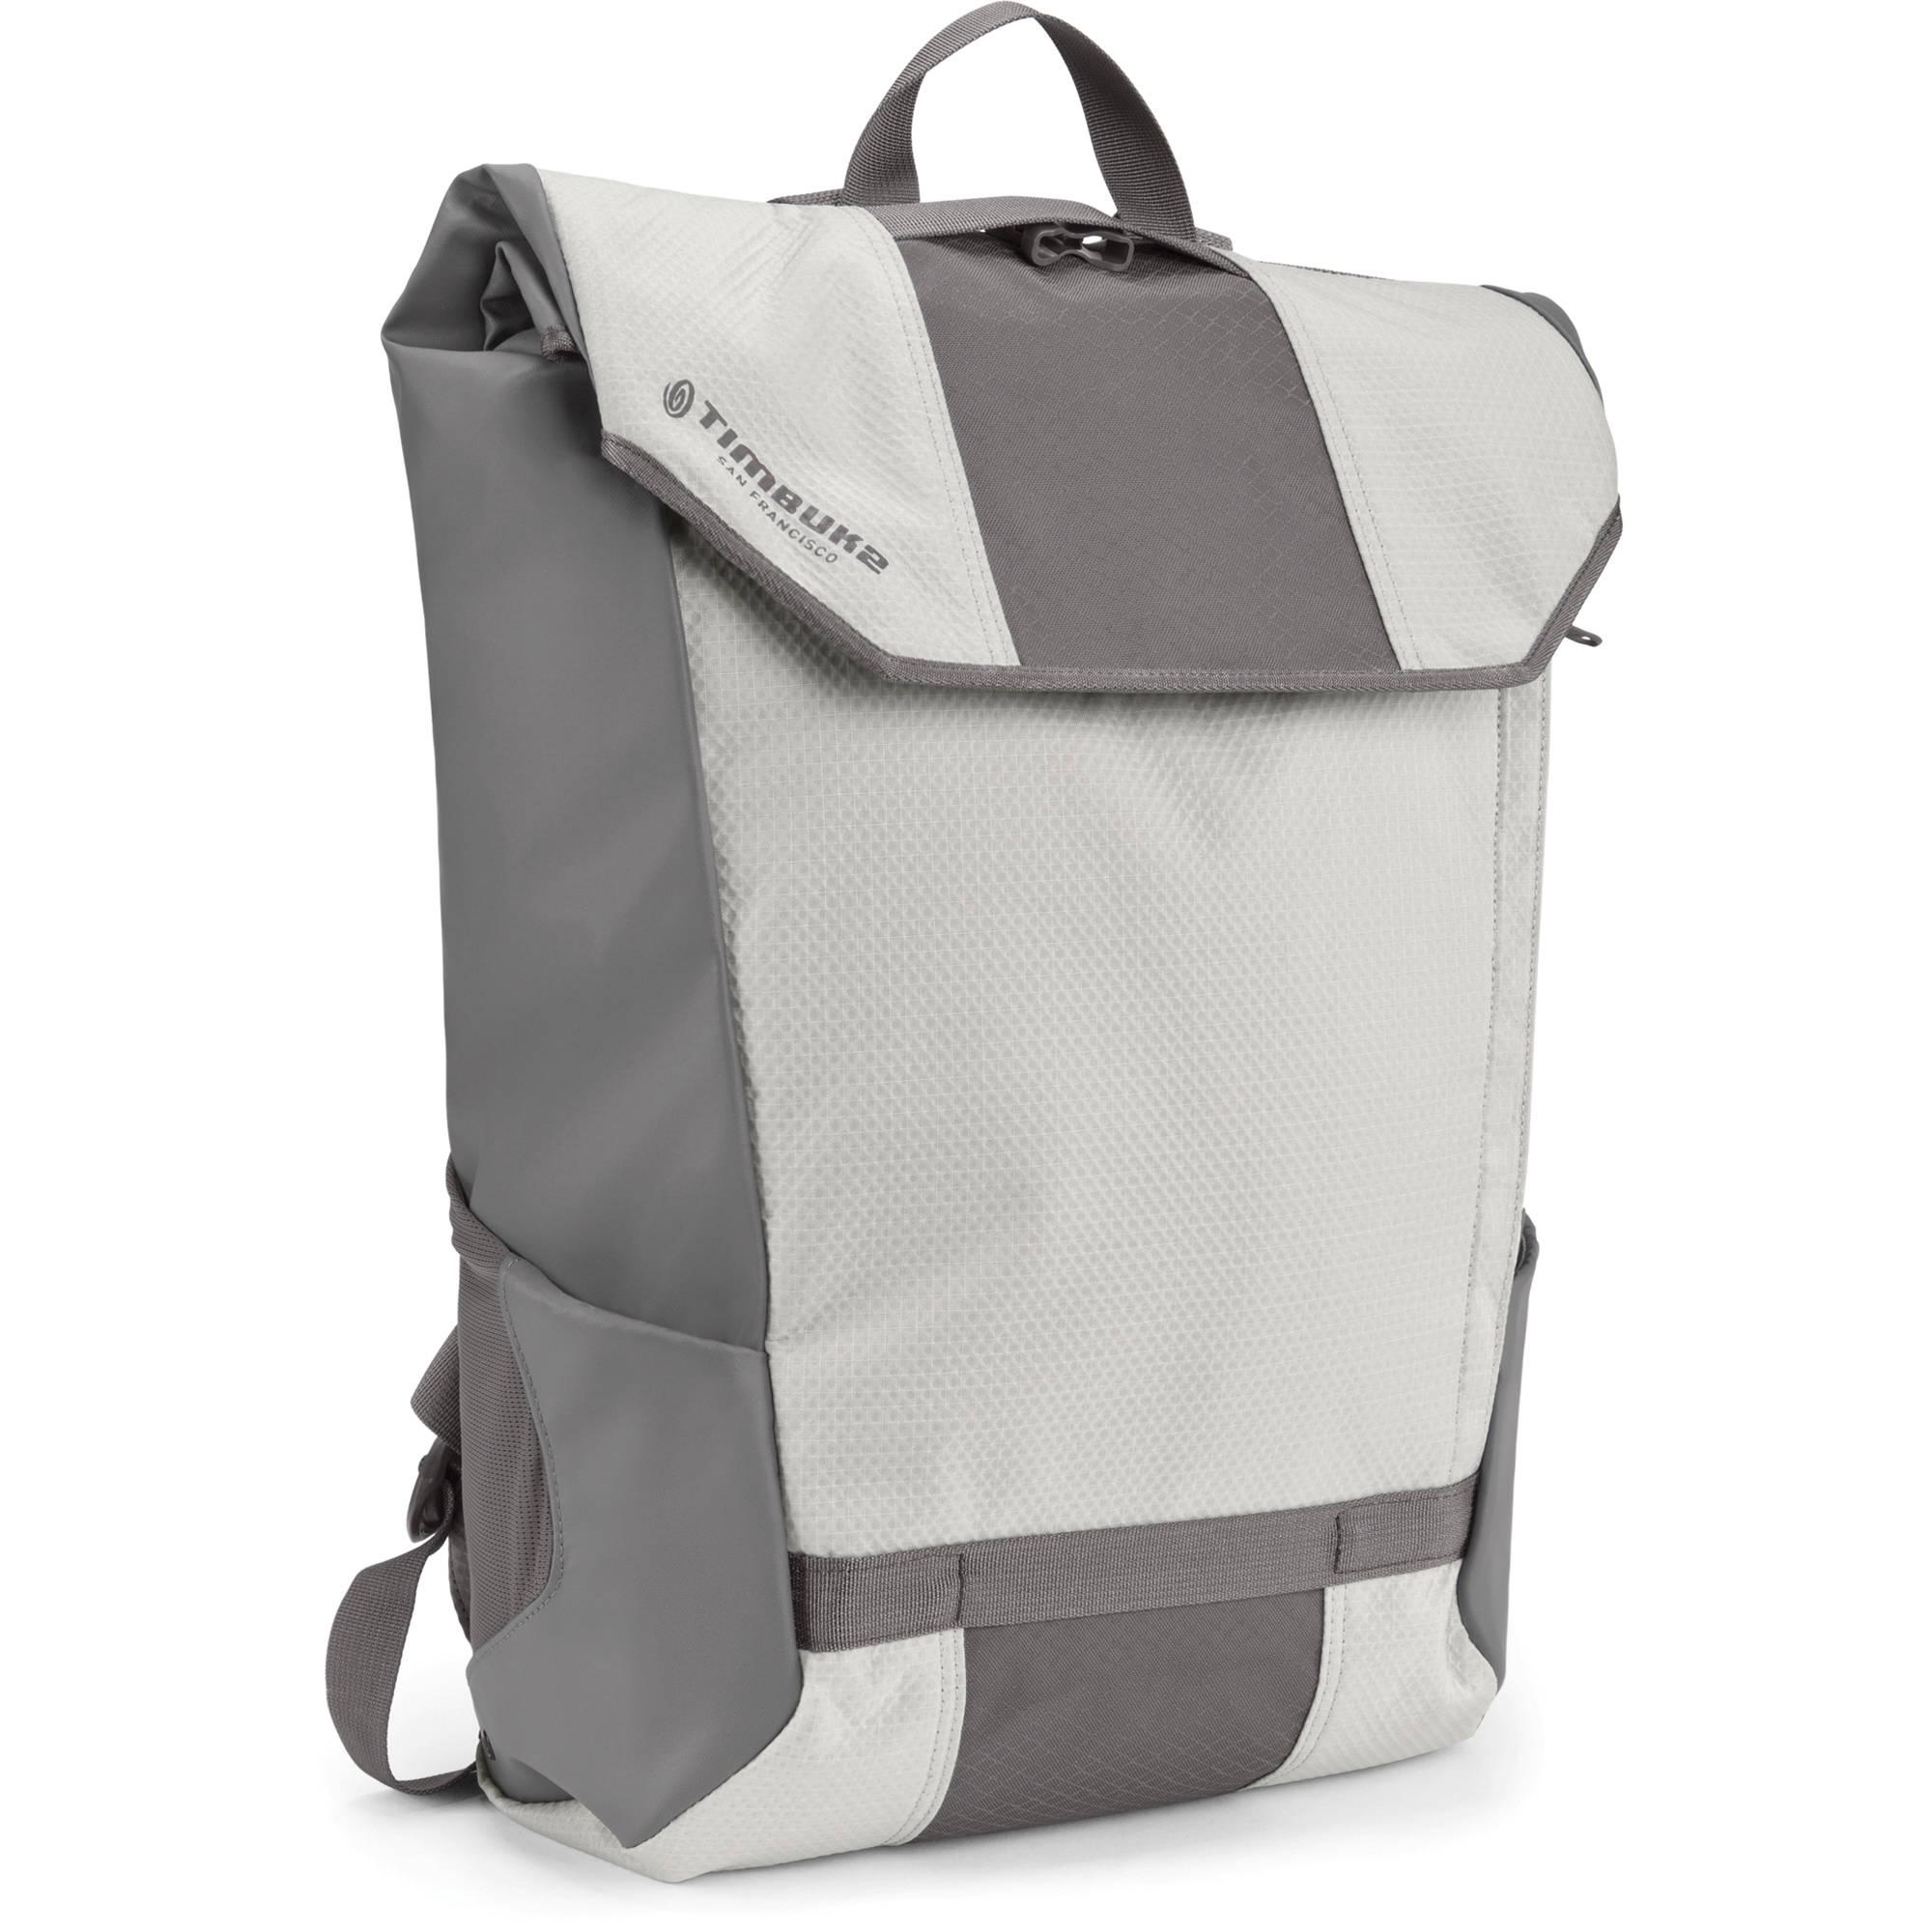 Timbuk2 Especial Vuelo Pack 458-3-1612 Multipurpose Daypacks Accessories Sports \u0026 Fitness ...